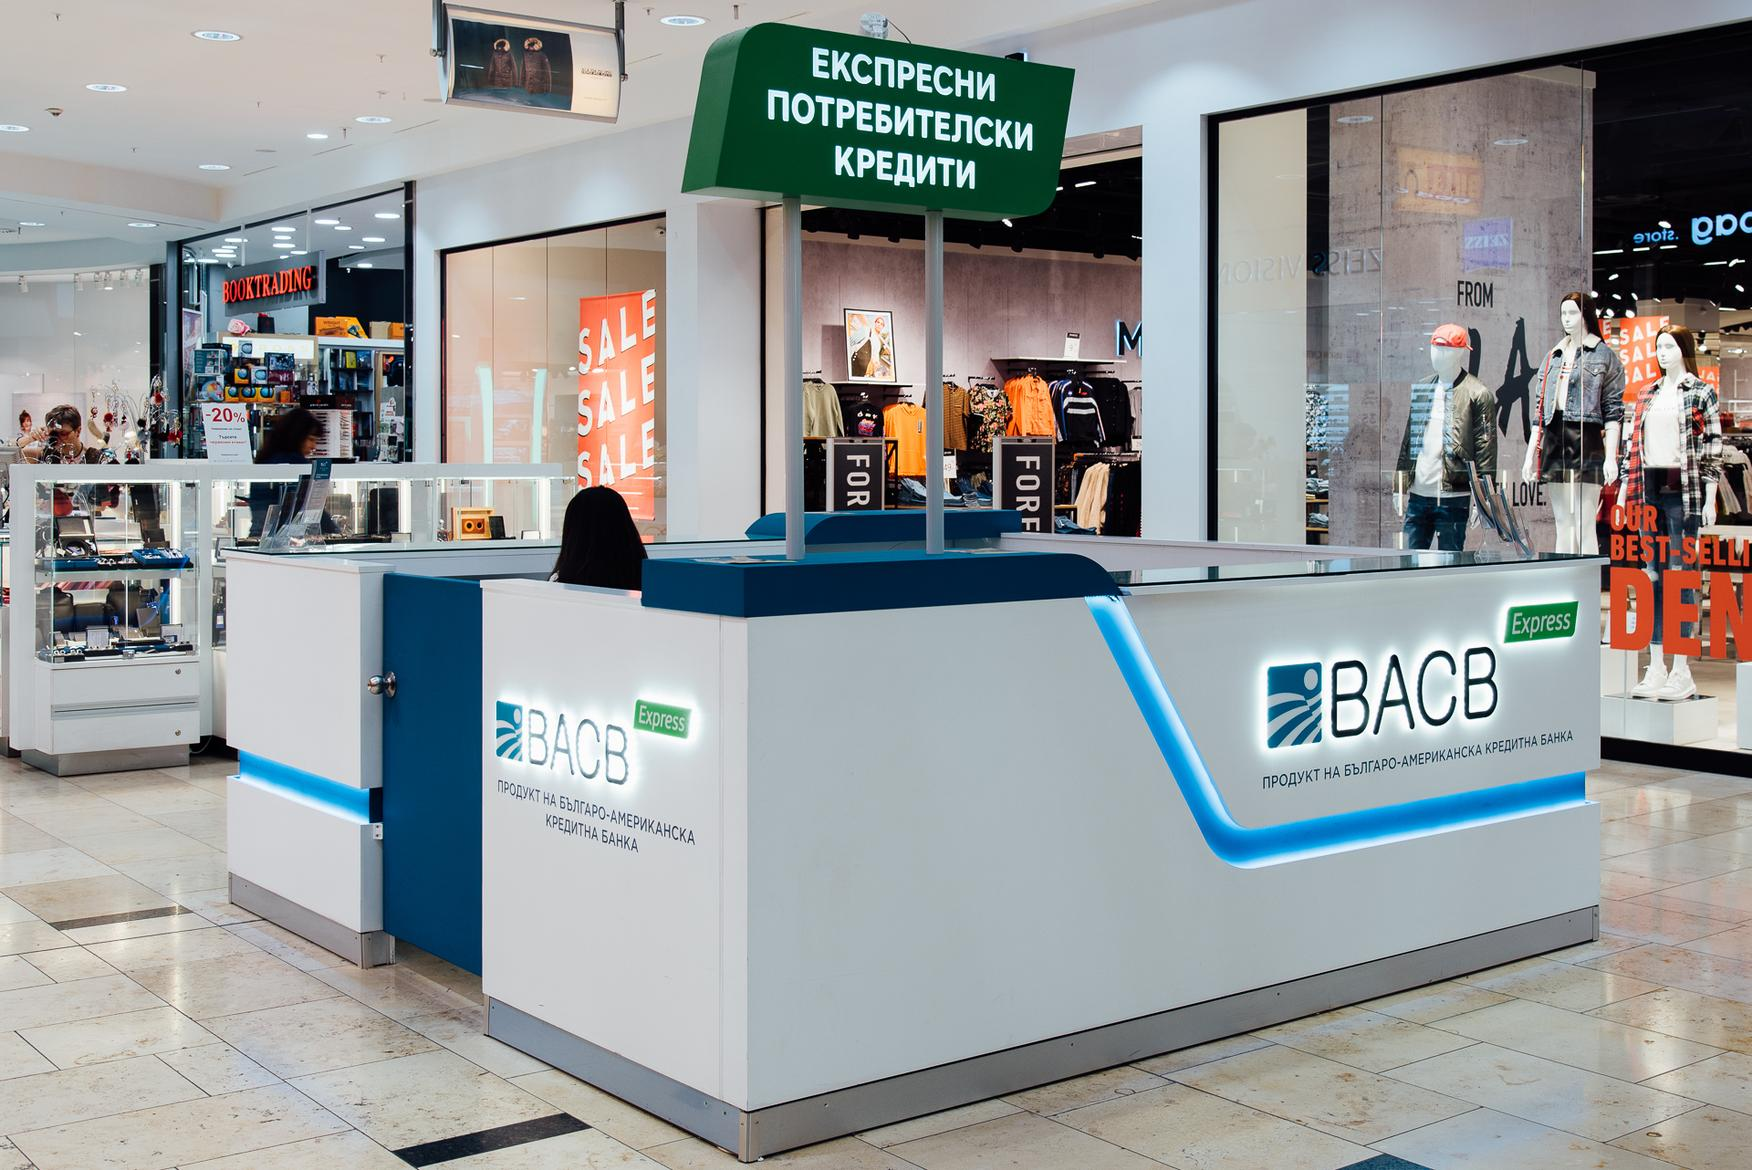 Българо-американска кредитна банка